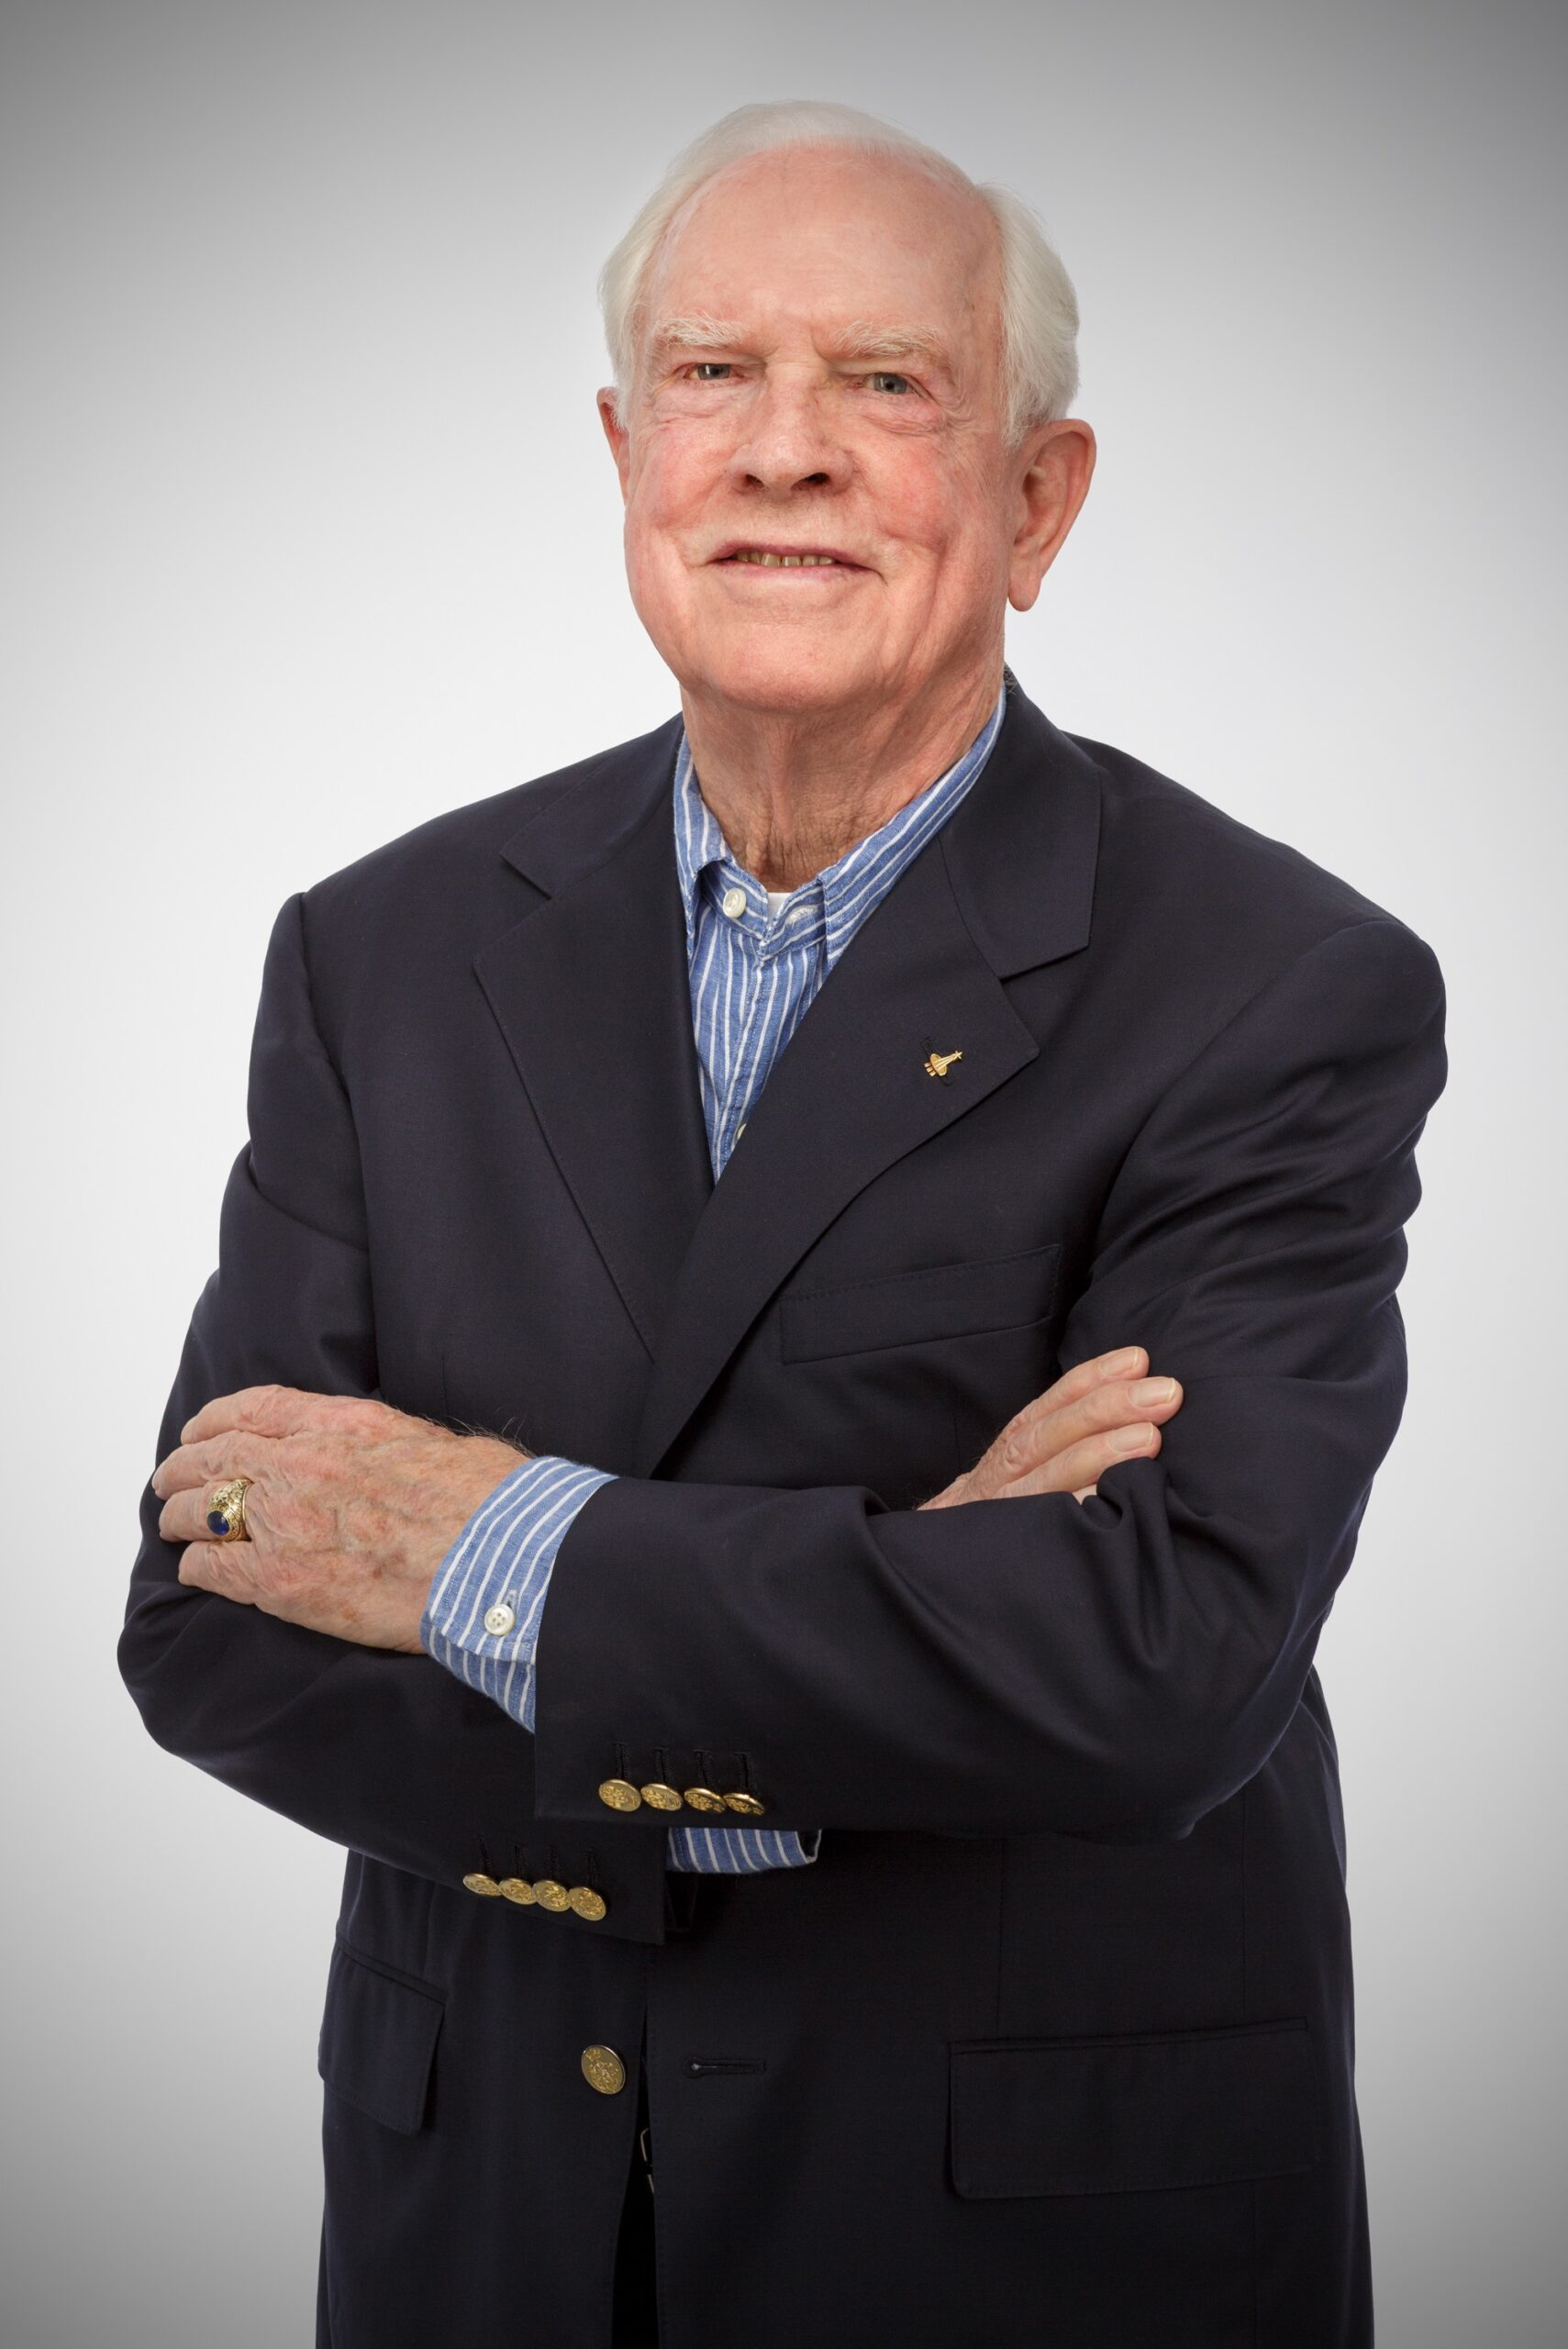 Dave Scott Founding Advisor Humatics